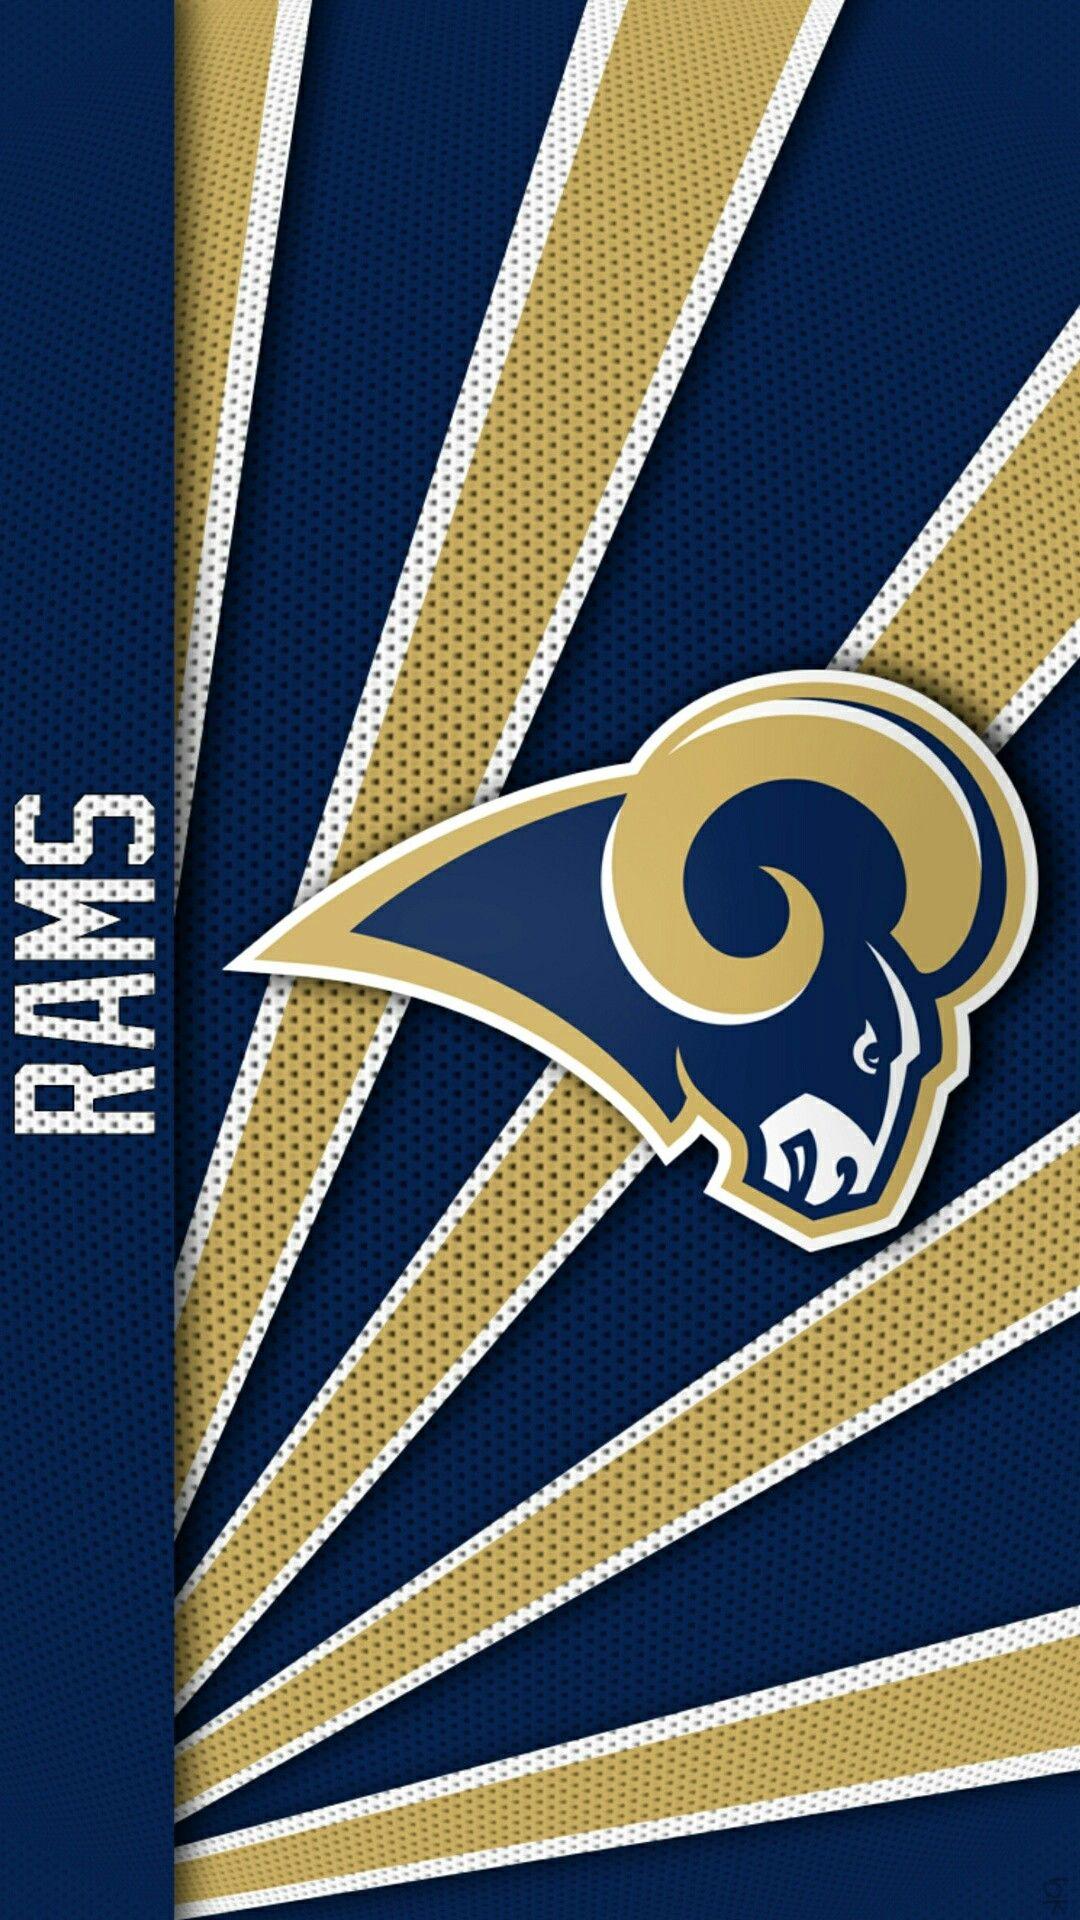 Go Rams Nfl Teams Logos Rams Football Los Angeles Rams